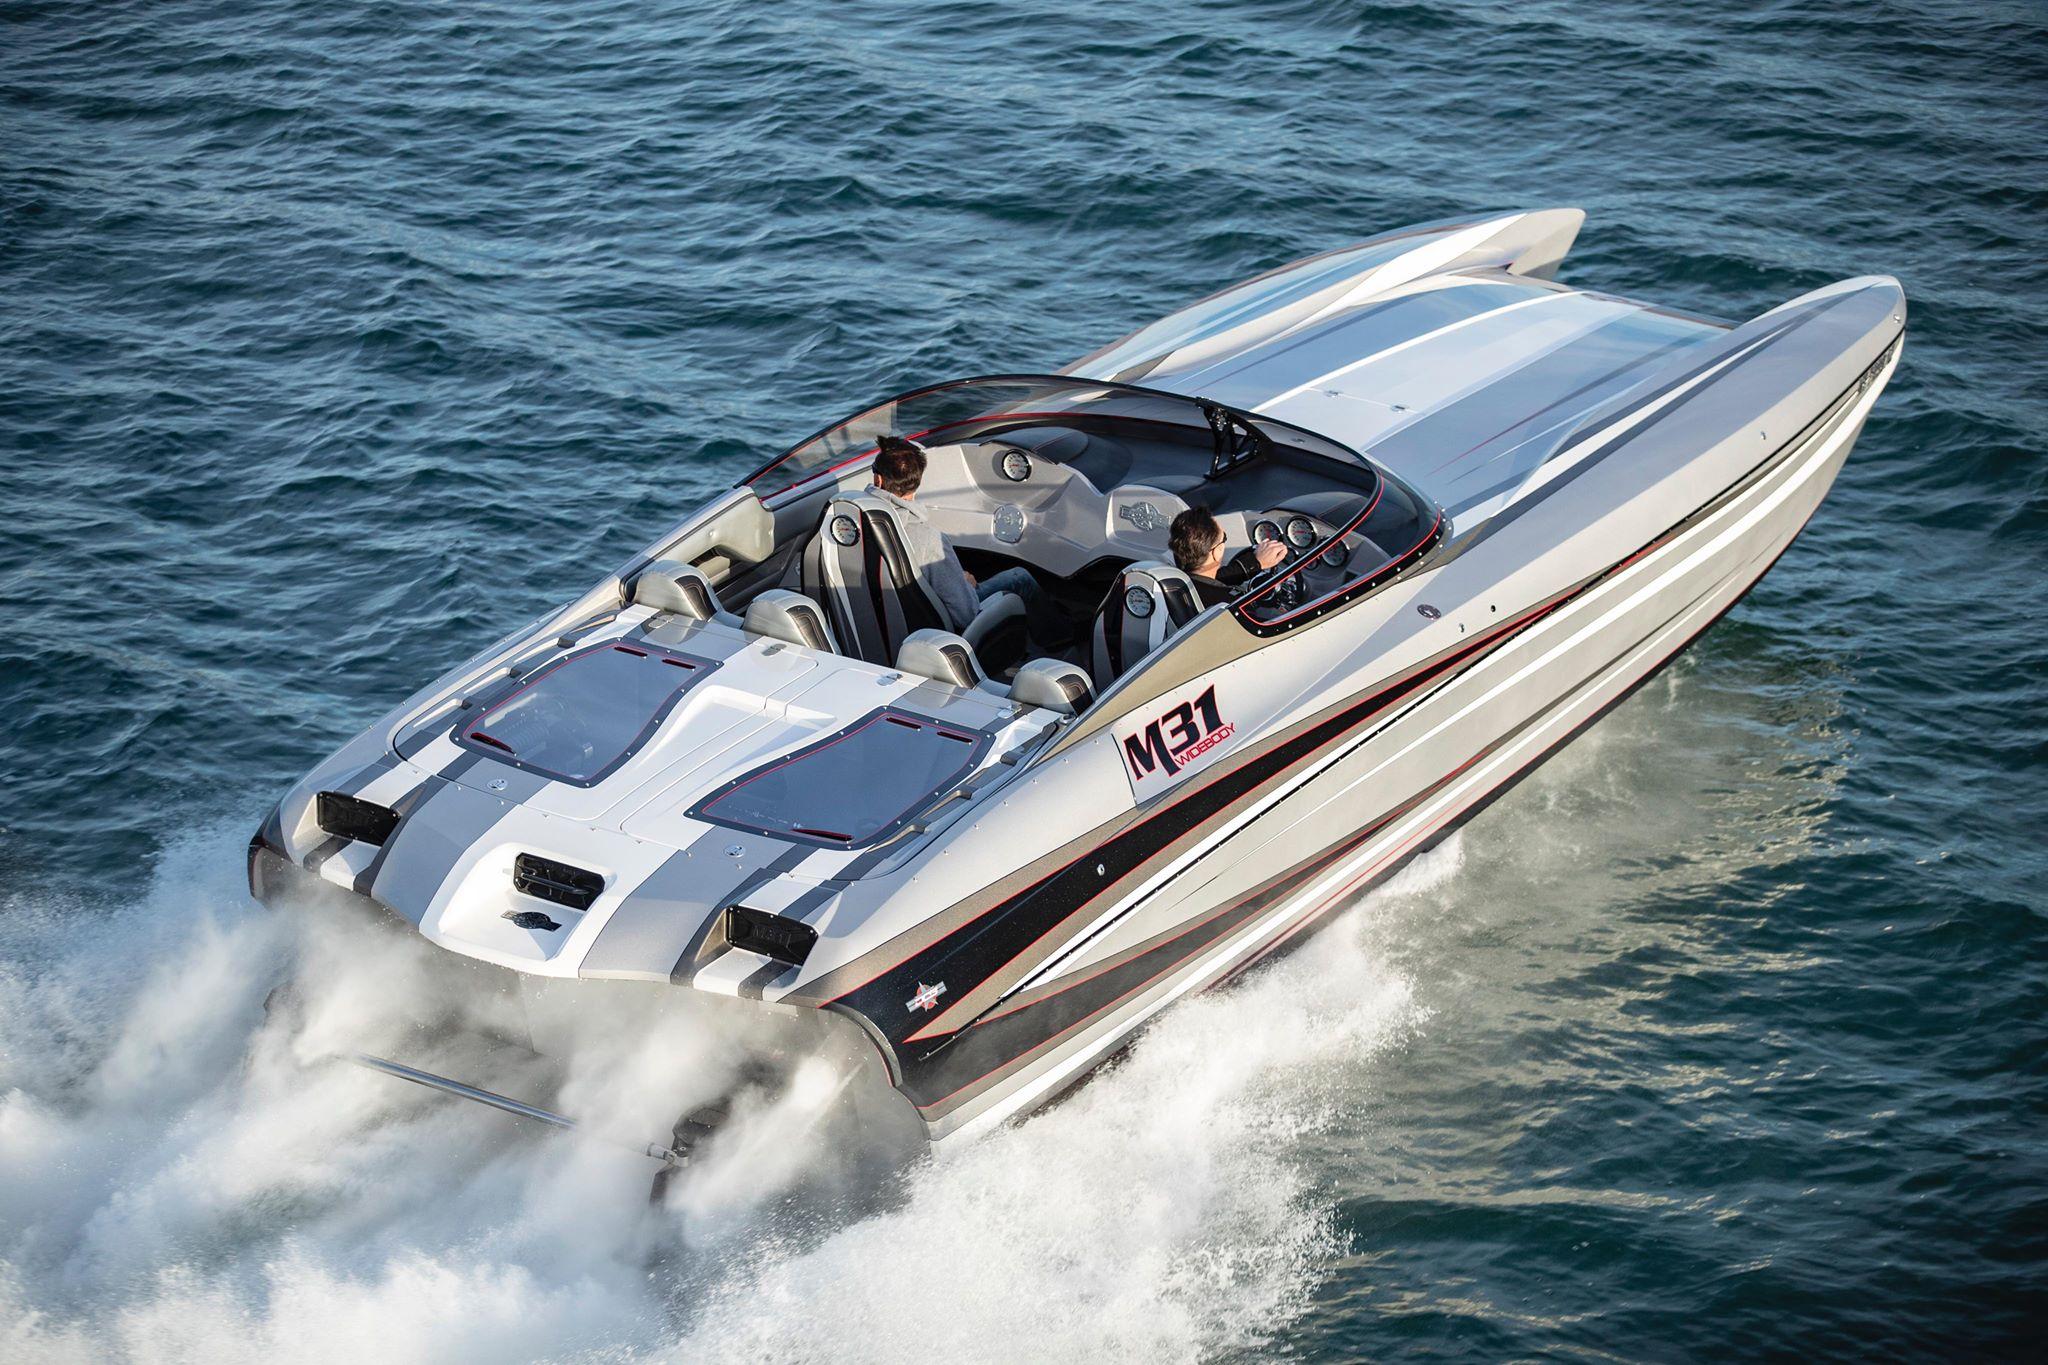 rockstarboats DCB M31